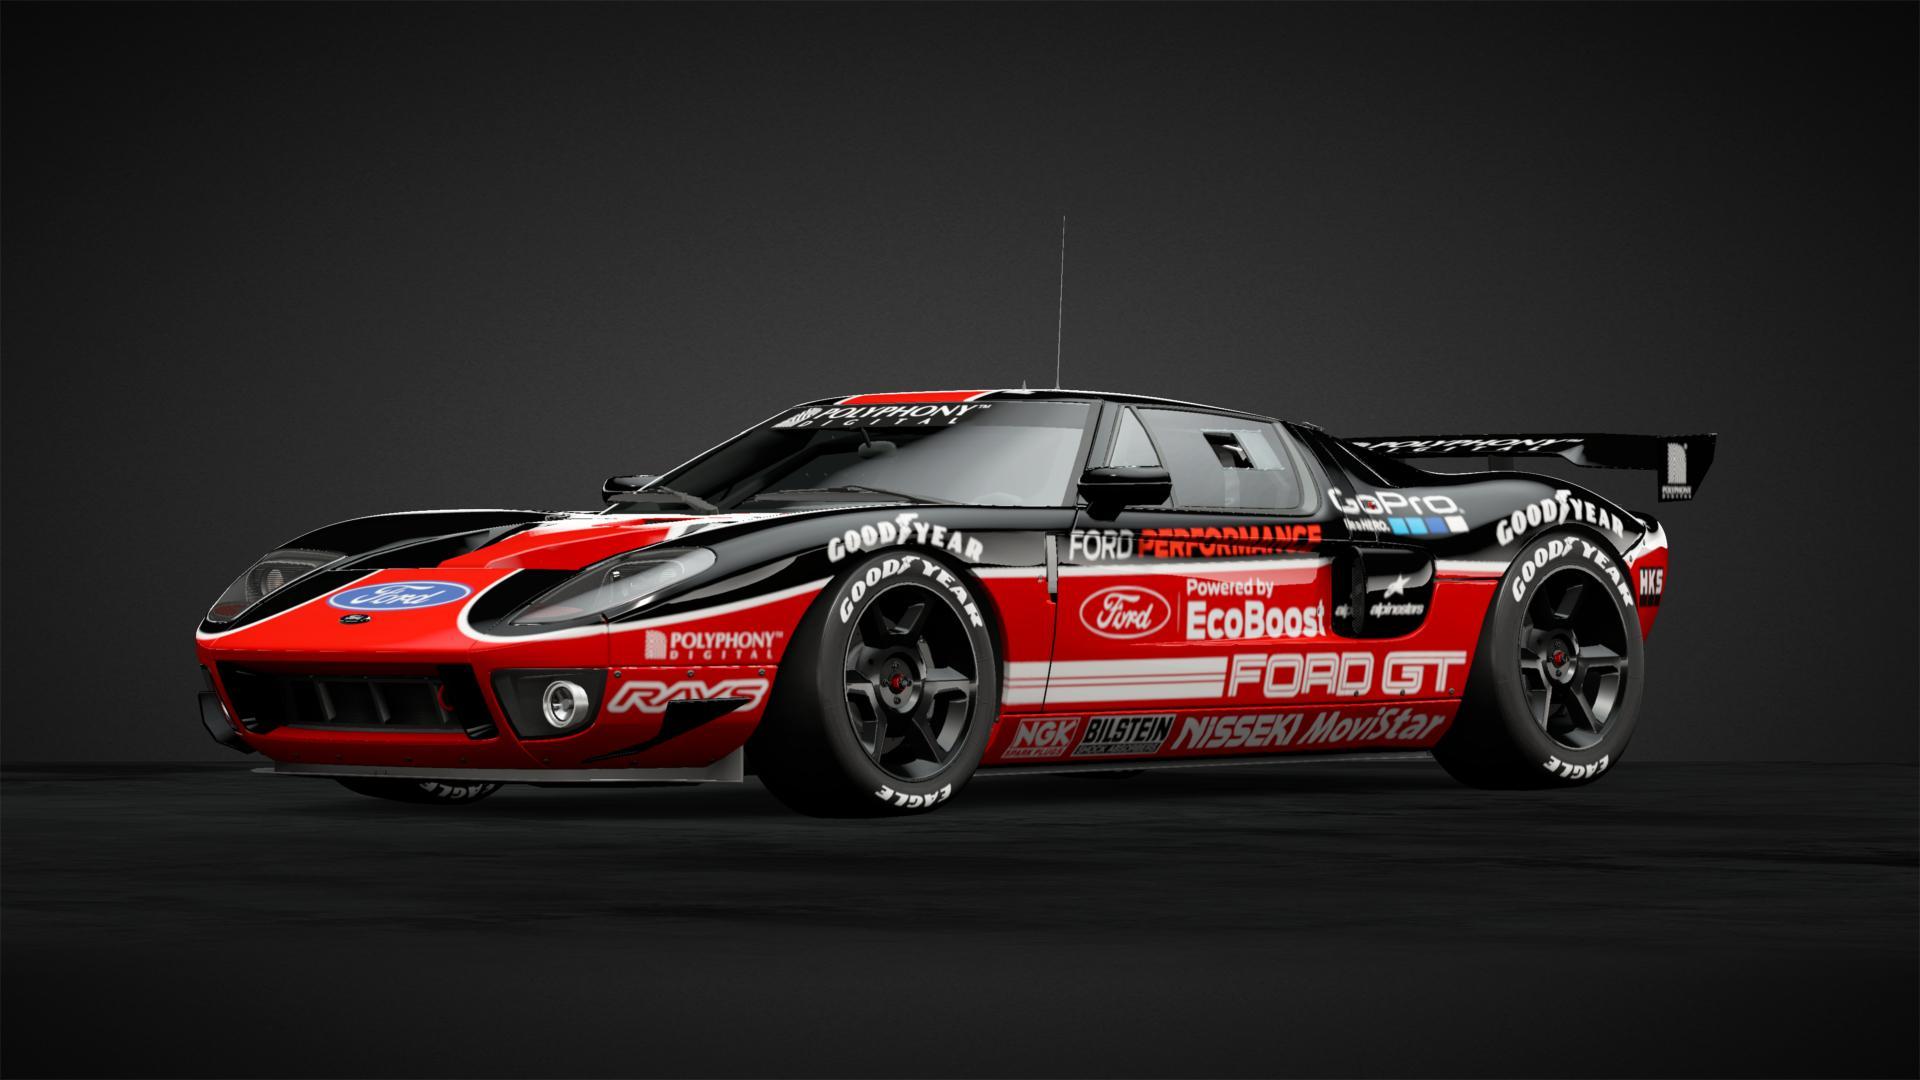 Ford Gt Lm Spec Test Car Ver  Car Livery By T Sasacom Community Gran Turismo Sport